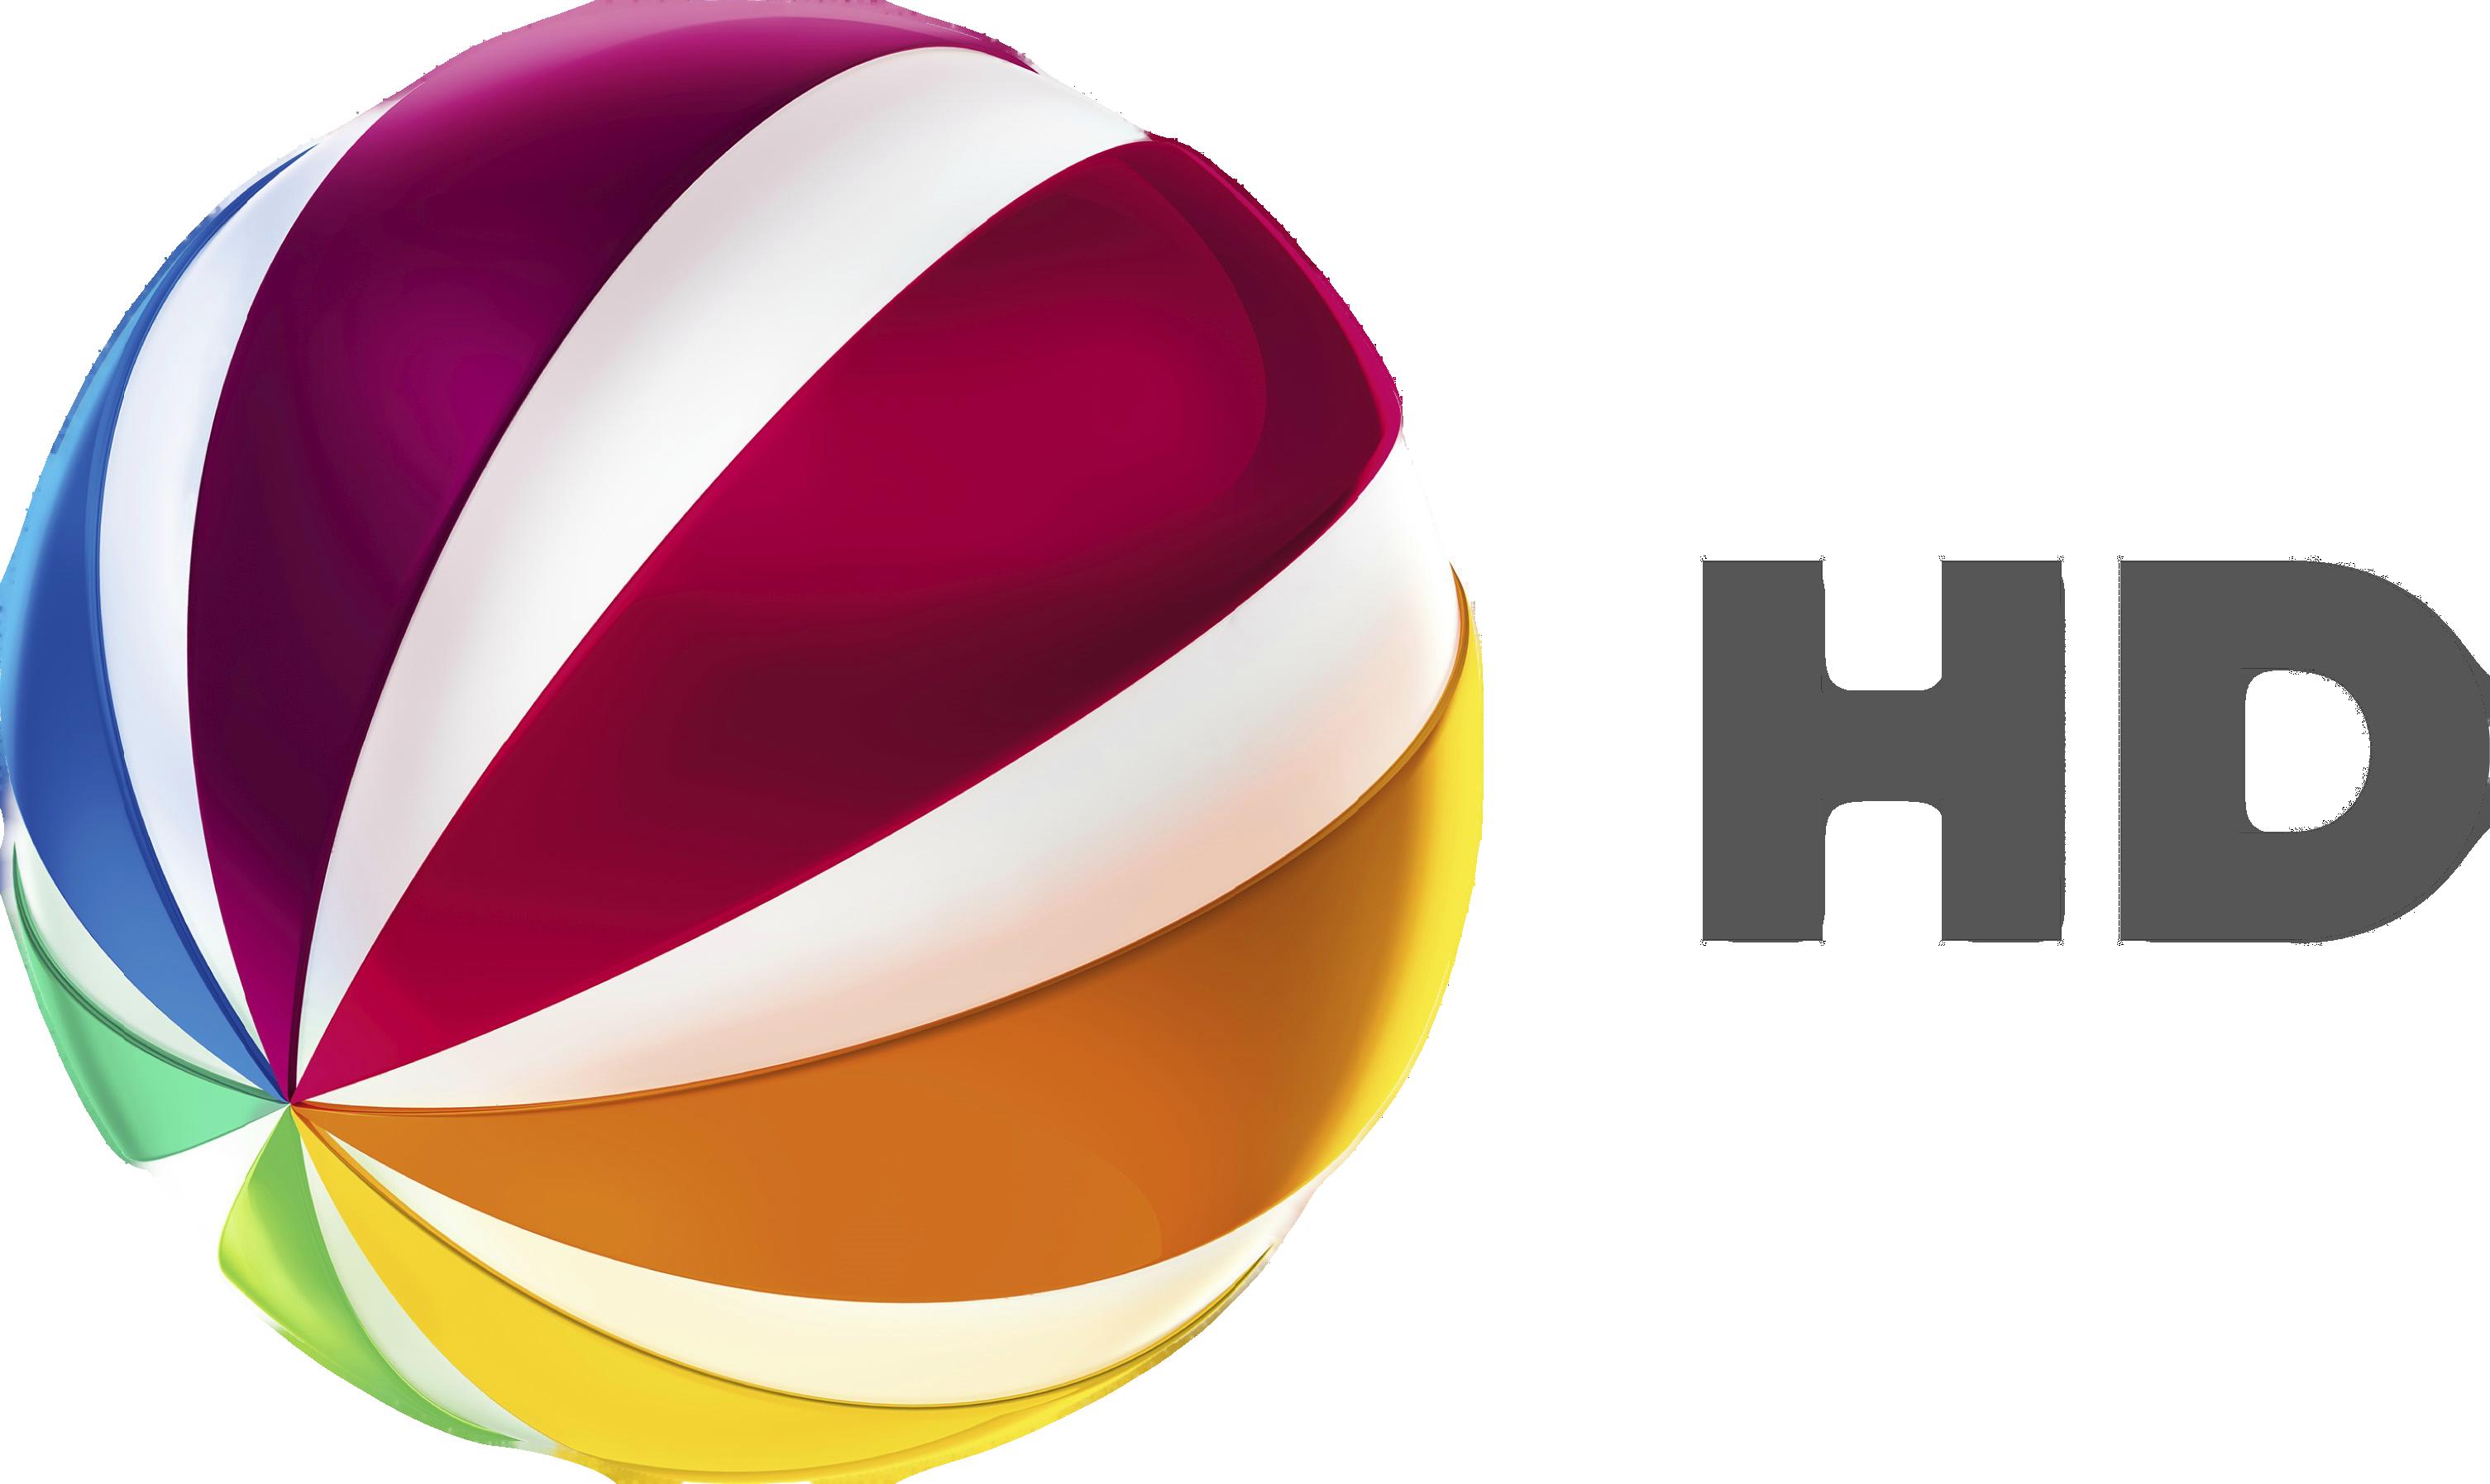 Satellite HD PNG - 119150